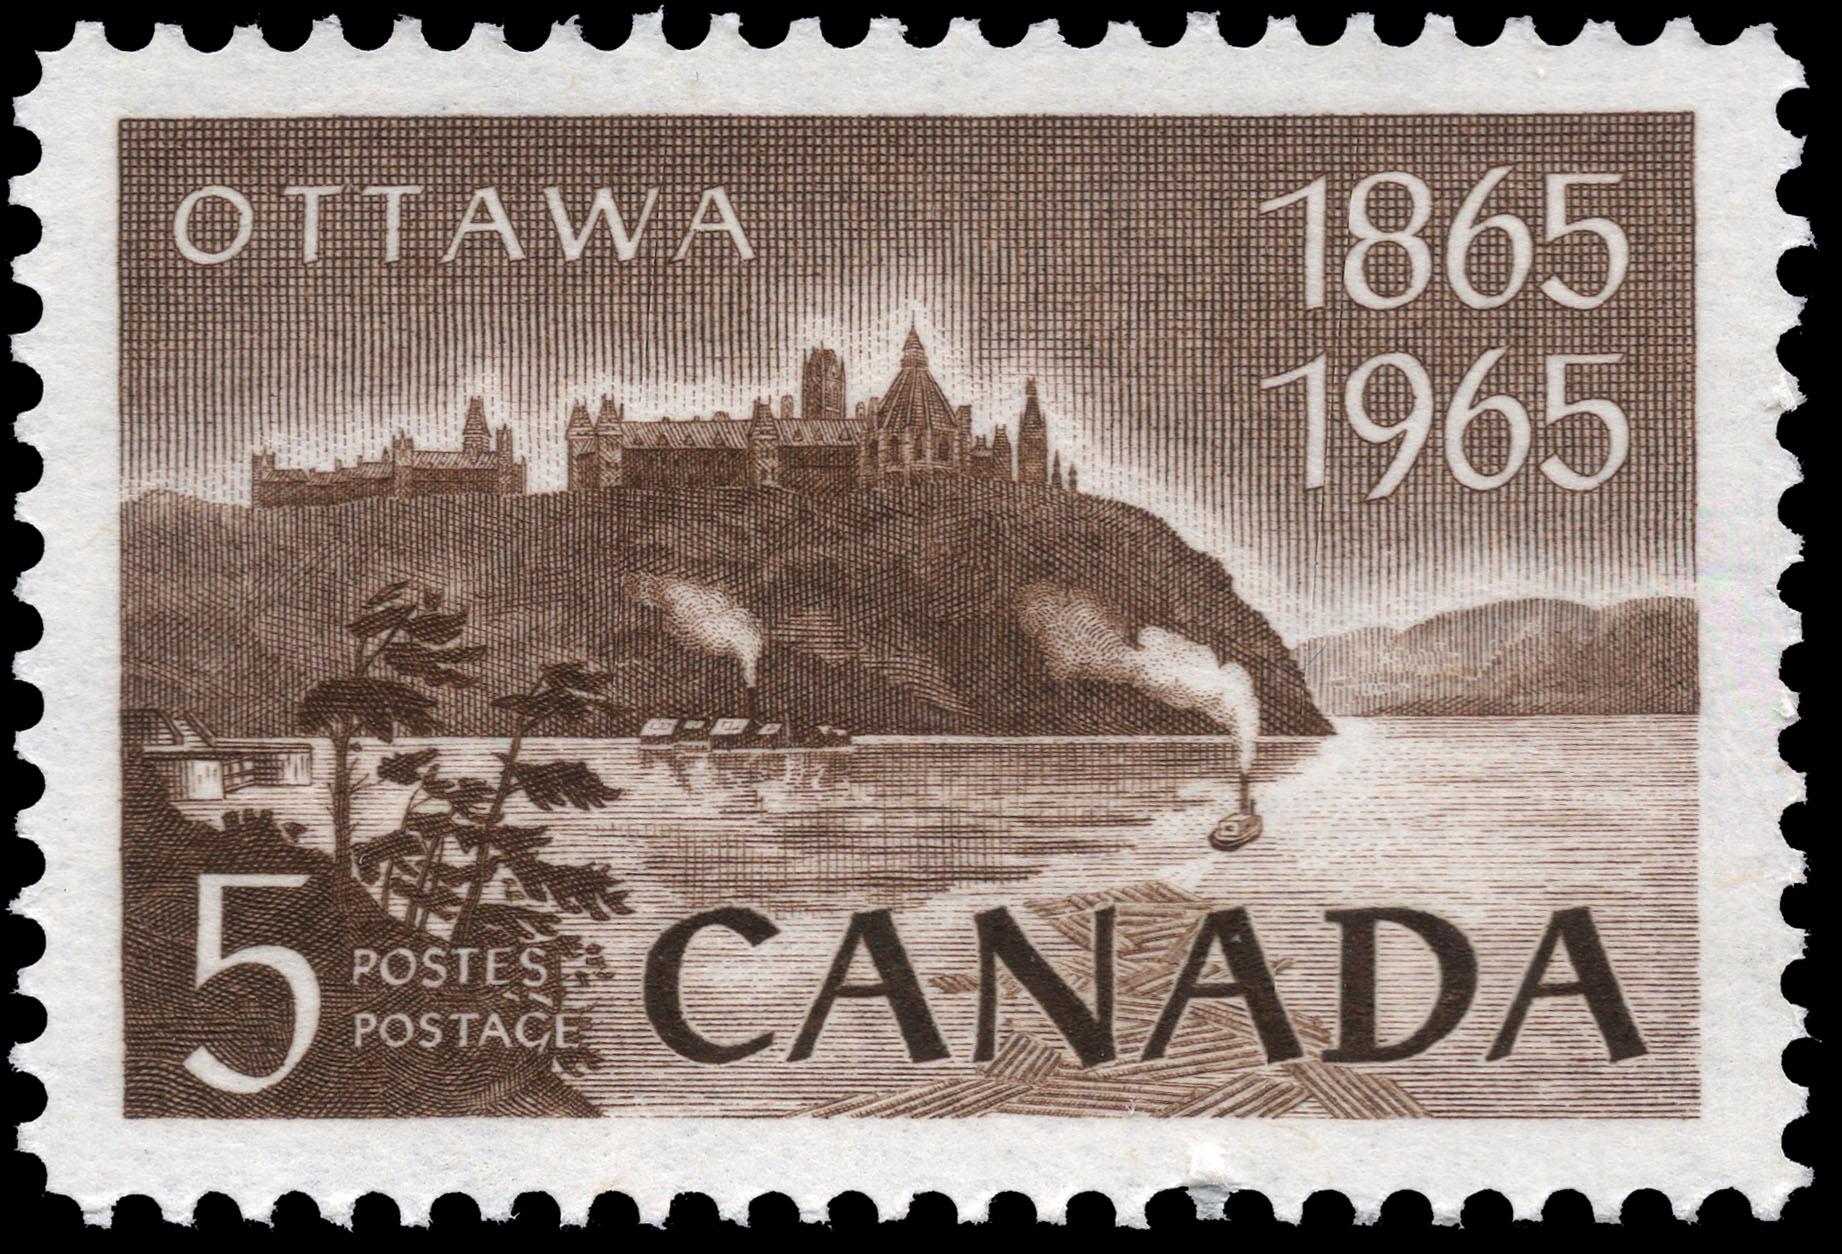 Ottawa, 1865-1965 Canada Postage Stamp